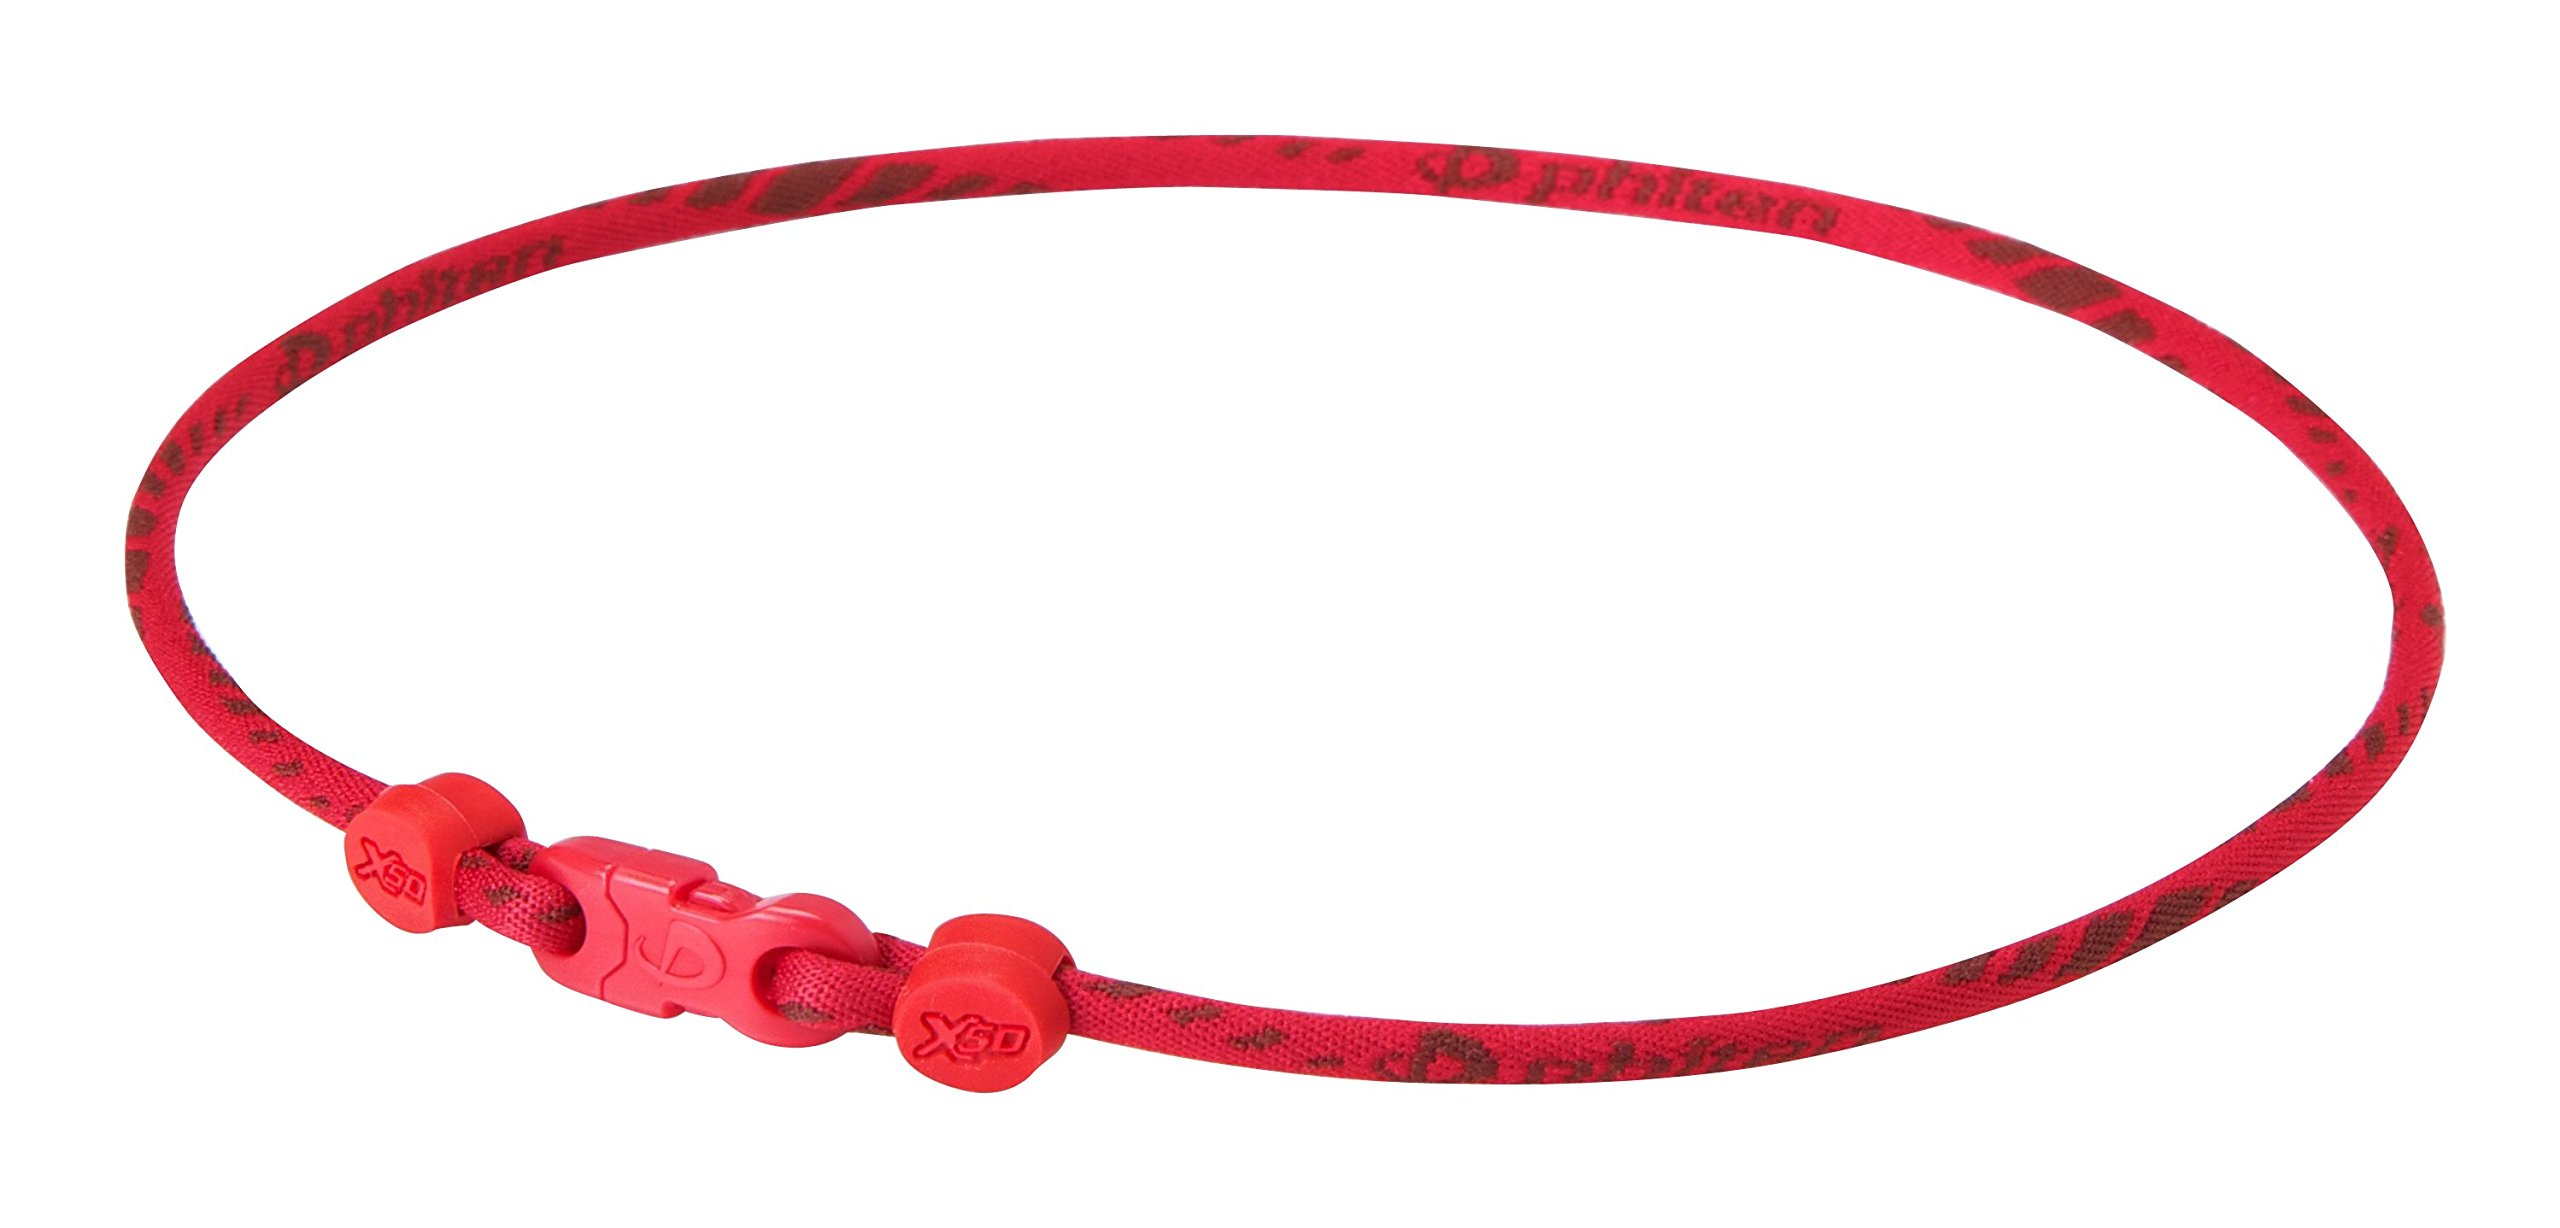 Phiten Rakuwa Titanium Necklace X50 Slim Type Made in Japan [Japan Import] (19.7in(50cm), Red) by Ph